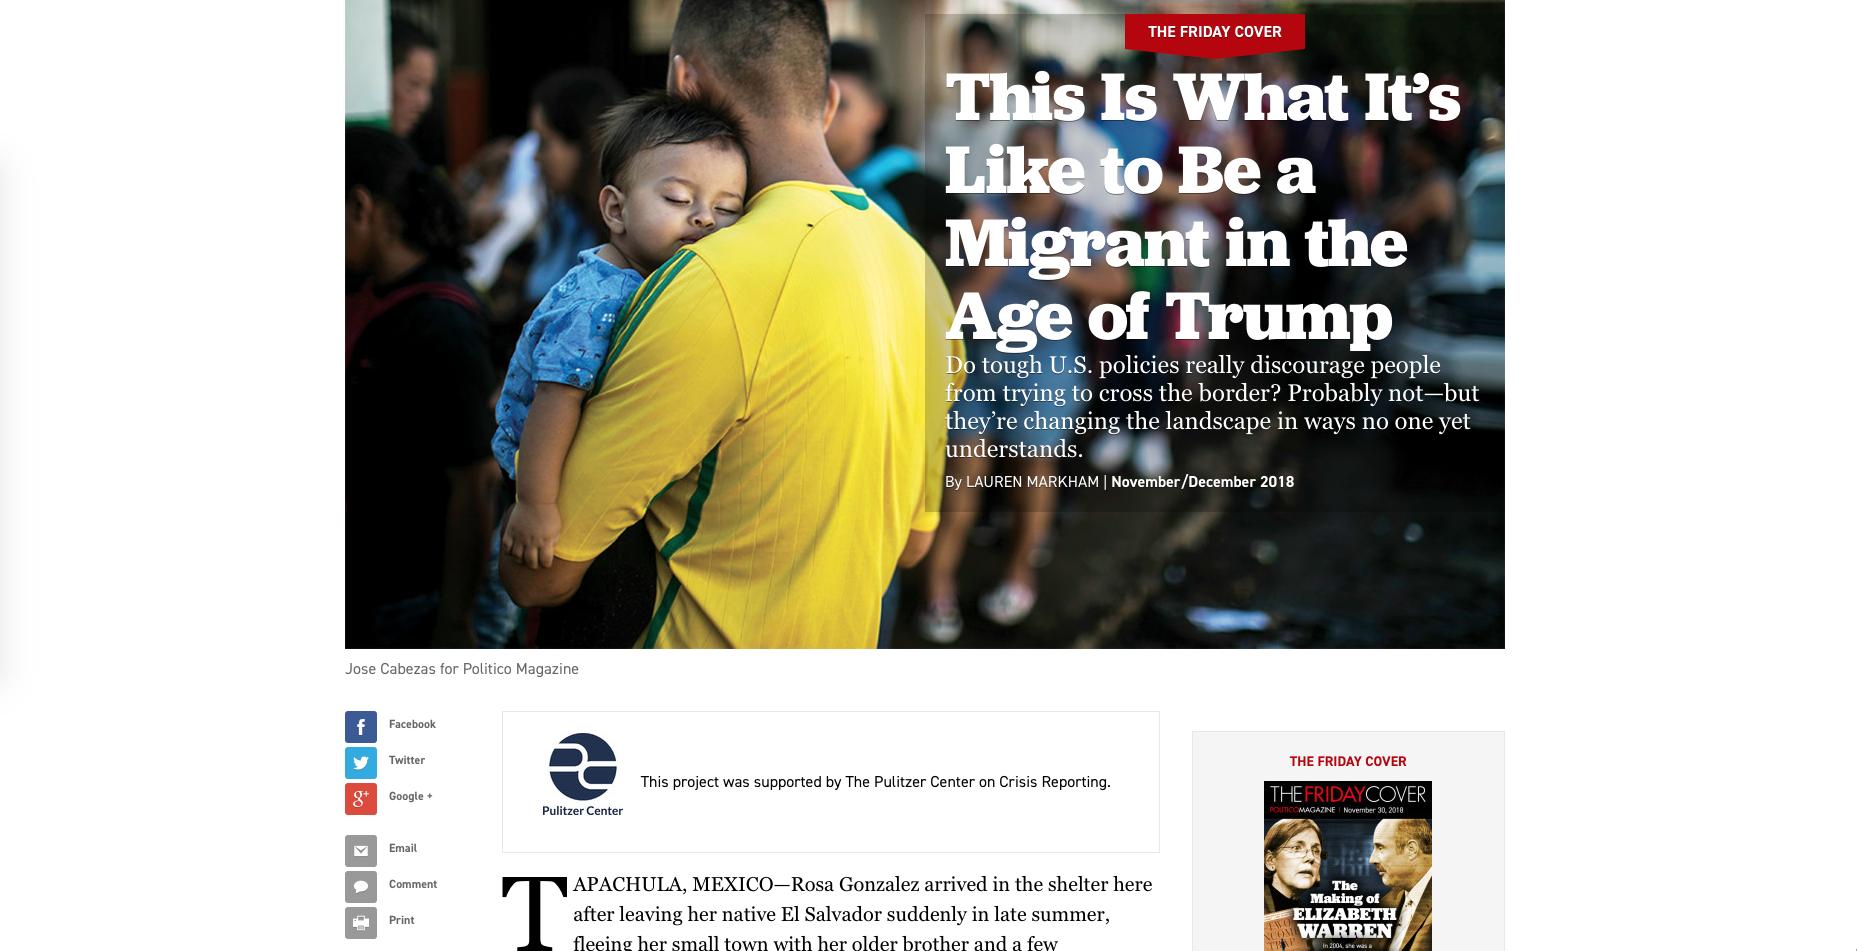 Politico credit for Pulitzer Center support.